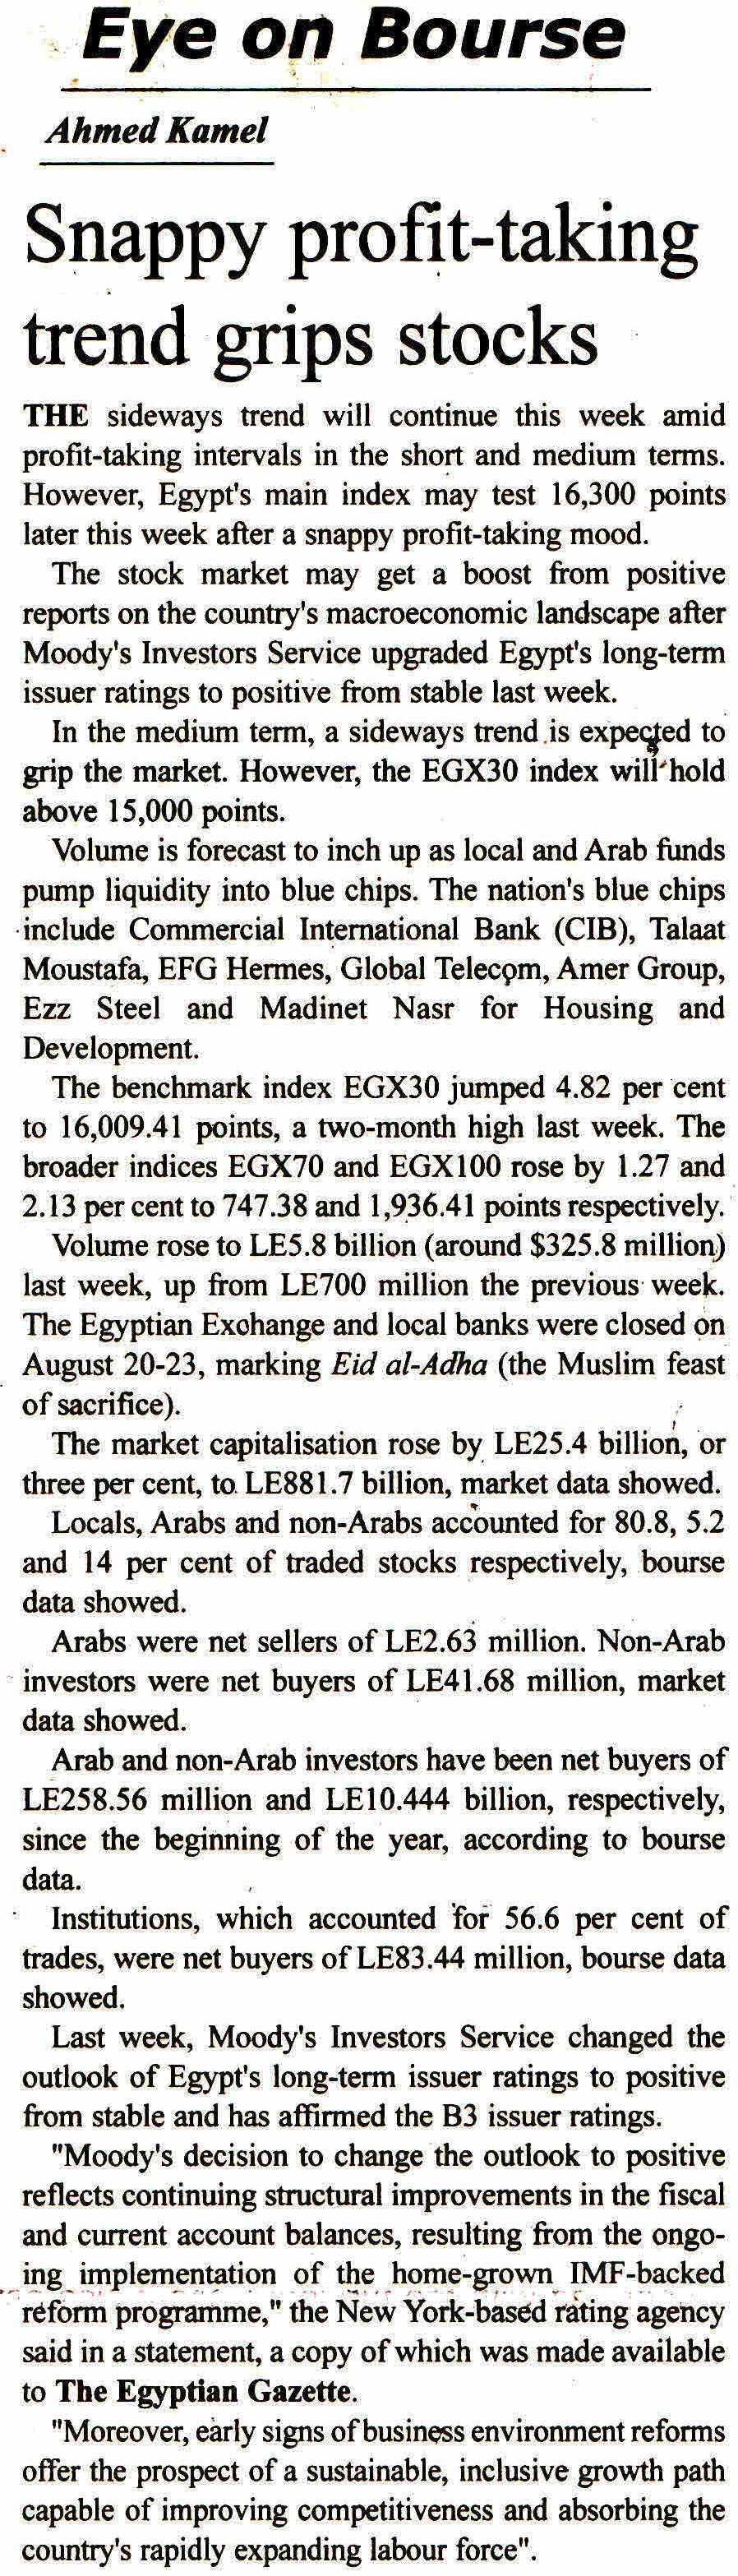 The Egyptian Gazette 2 Sep P.2.jpg